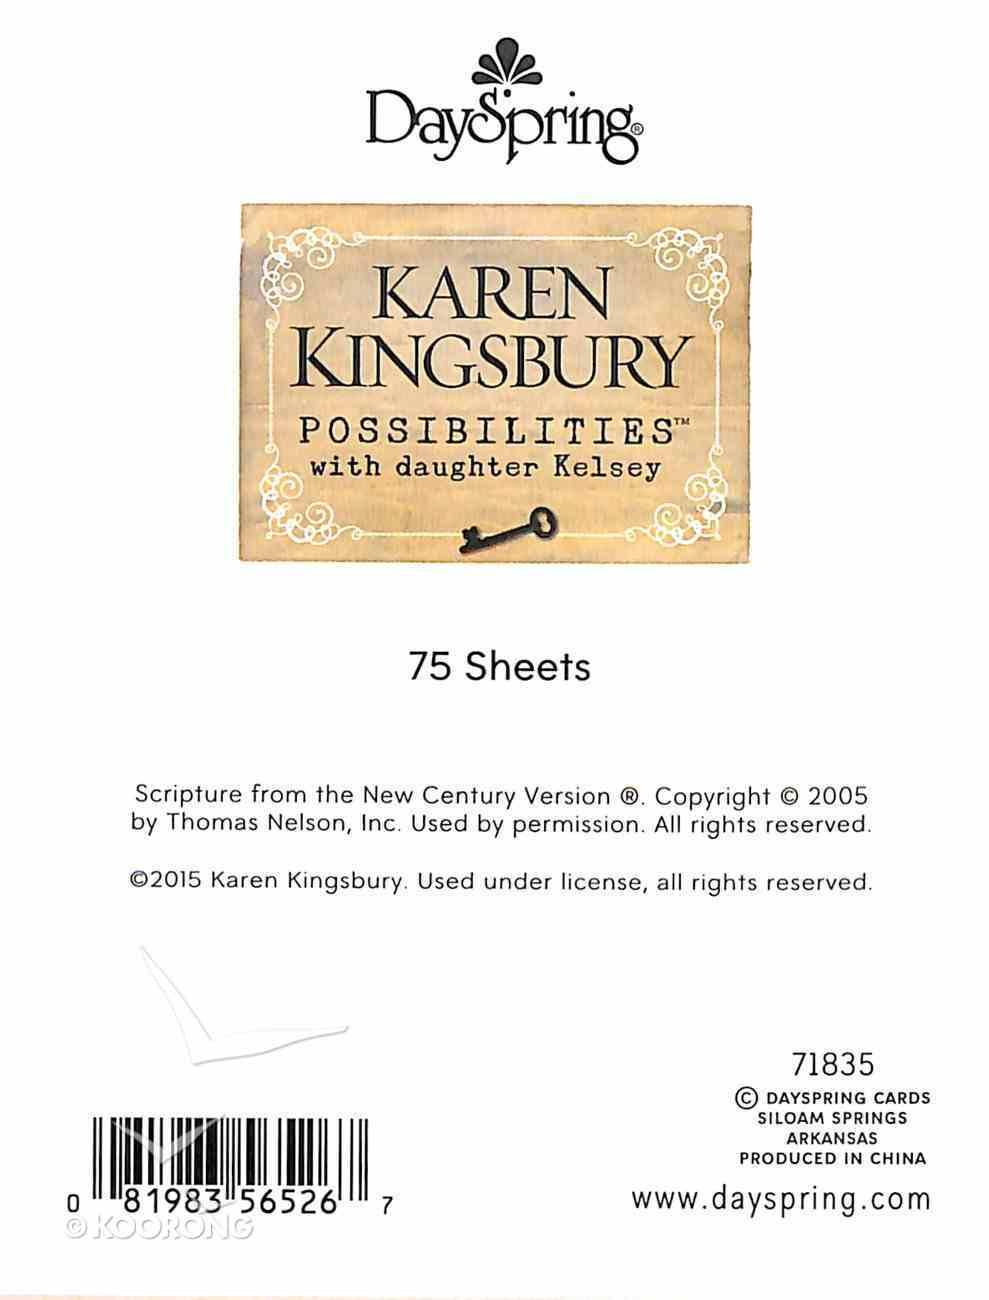 Purse Notes: Karen Kingsbury Possibilites Stationery